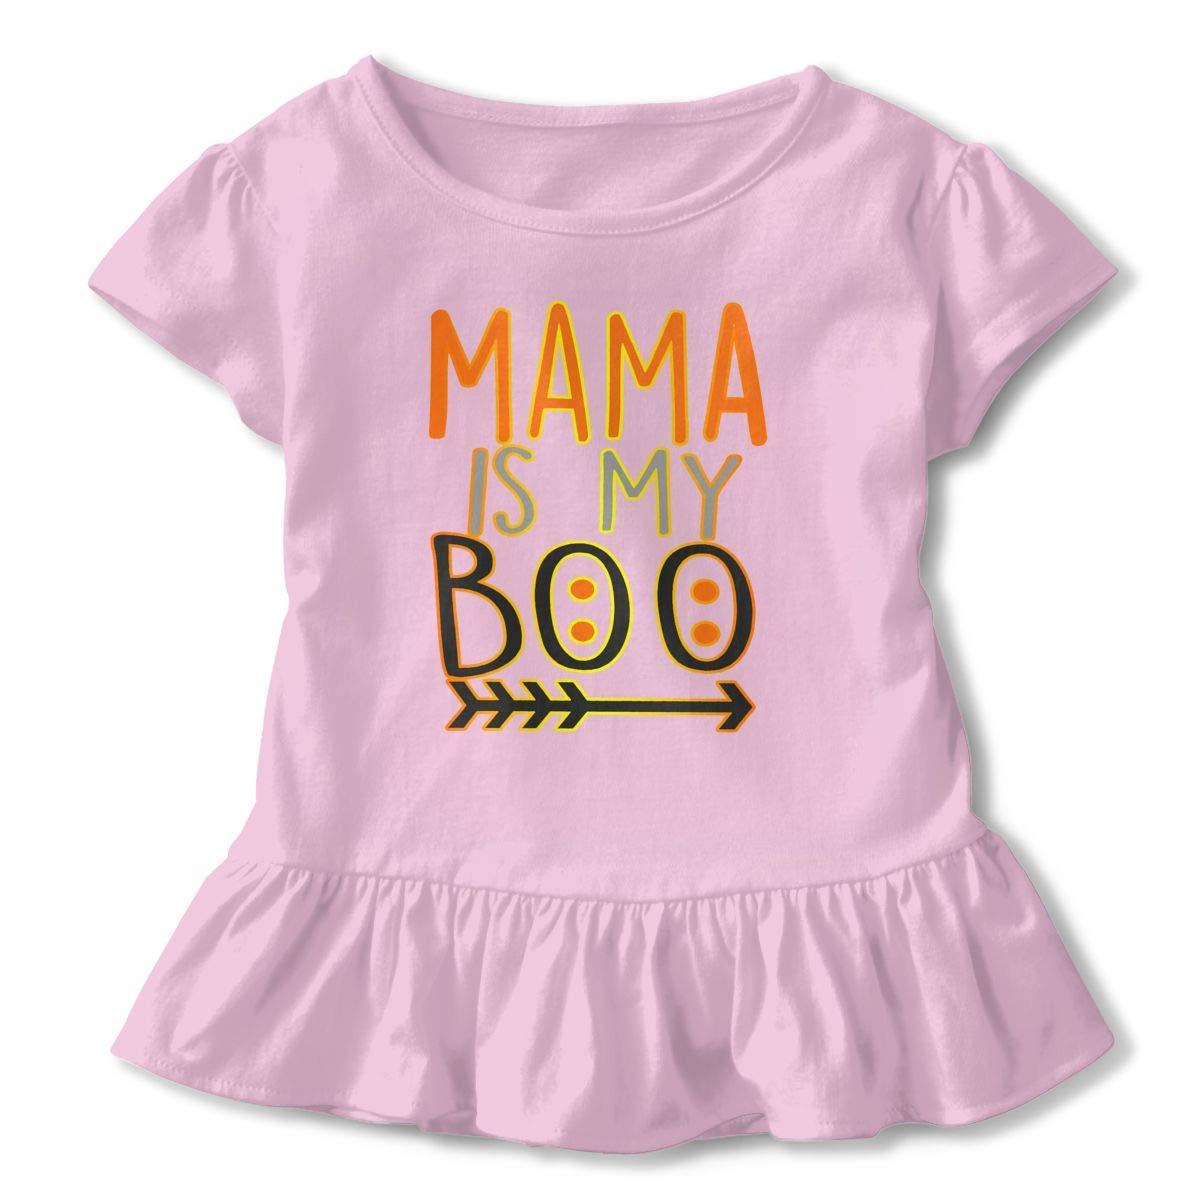 NMDJC CCQ Mama is My Boo Baby Skirts Adorable Kids T Shirt Dress Comfortable Flounces Layette